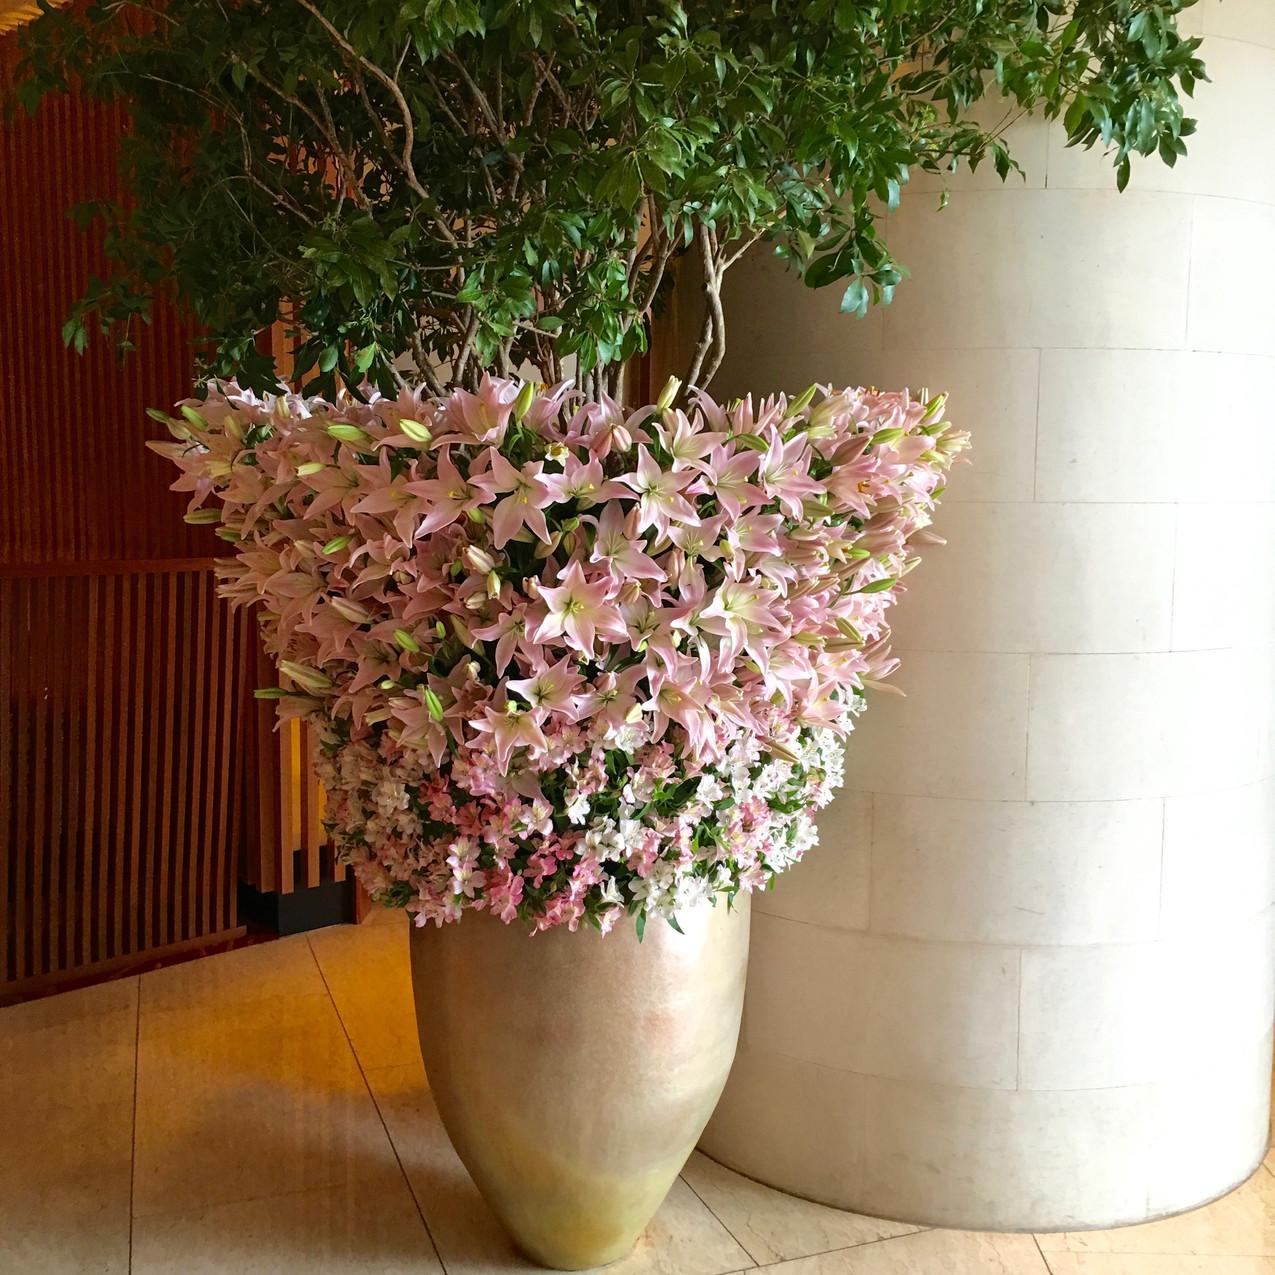 The Peninsula Flowers